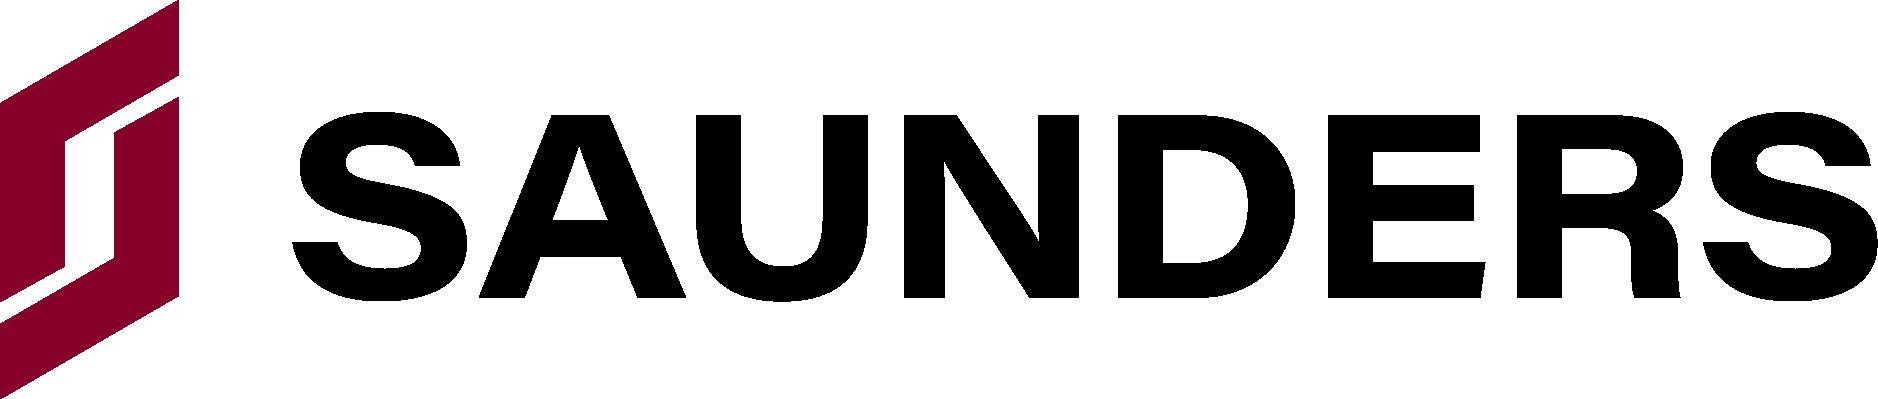 Saunders-Horiz-RGB